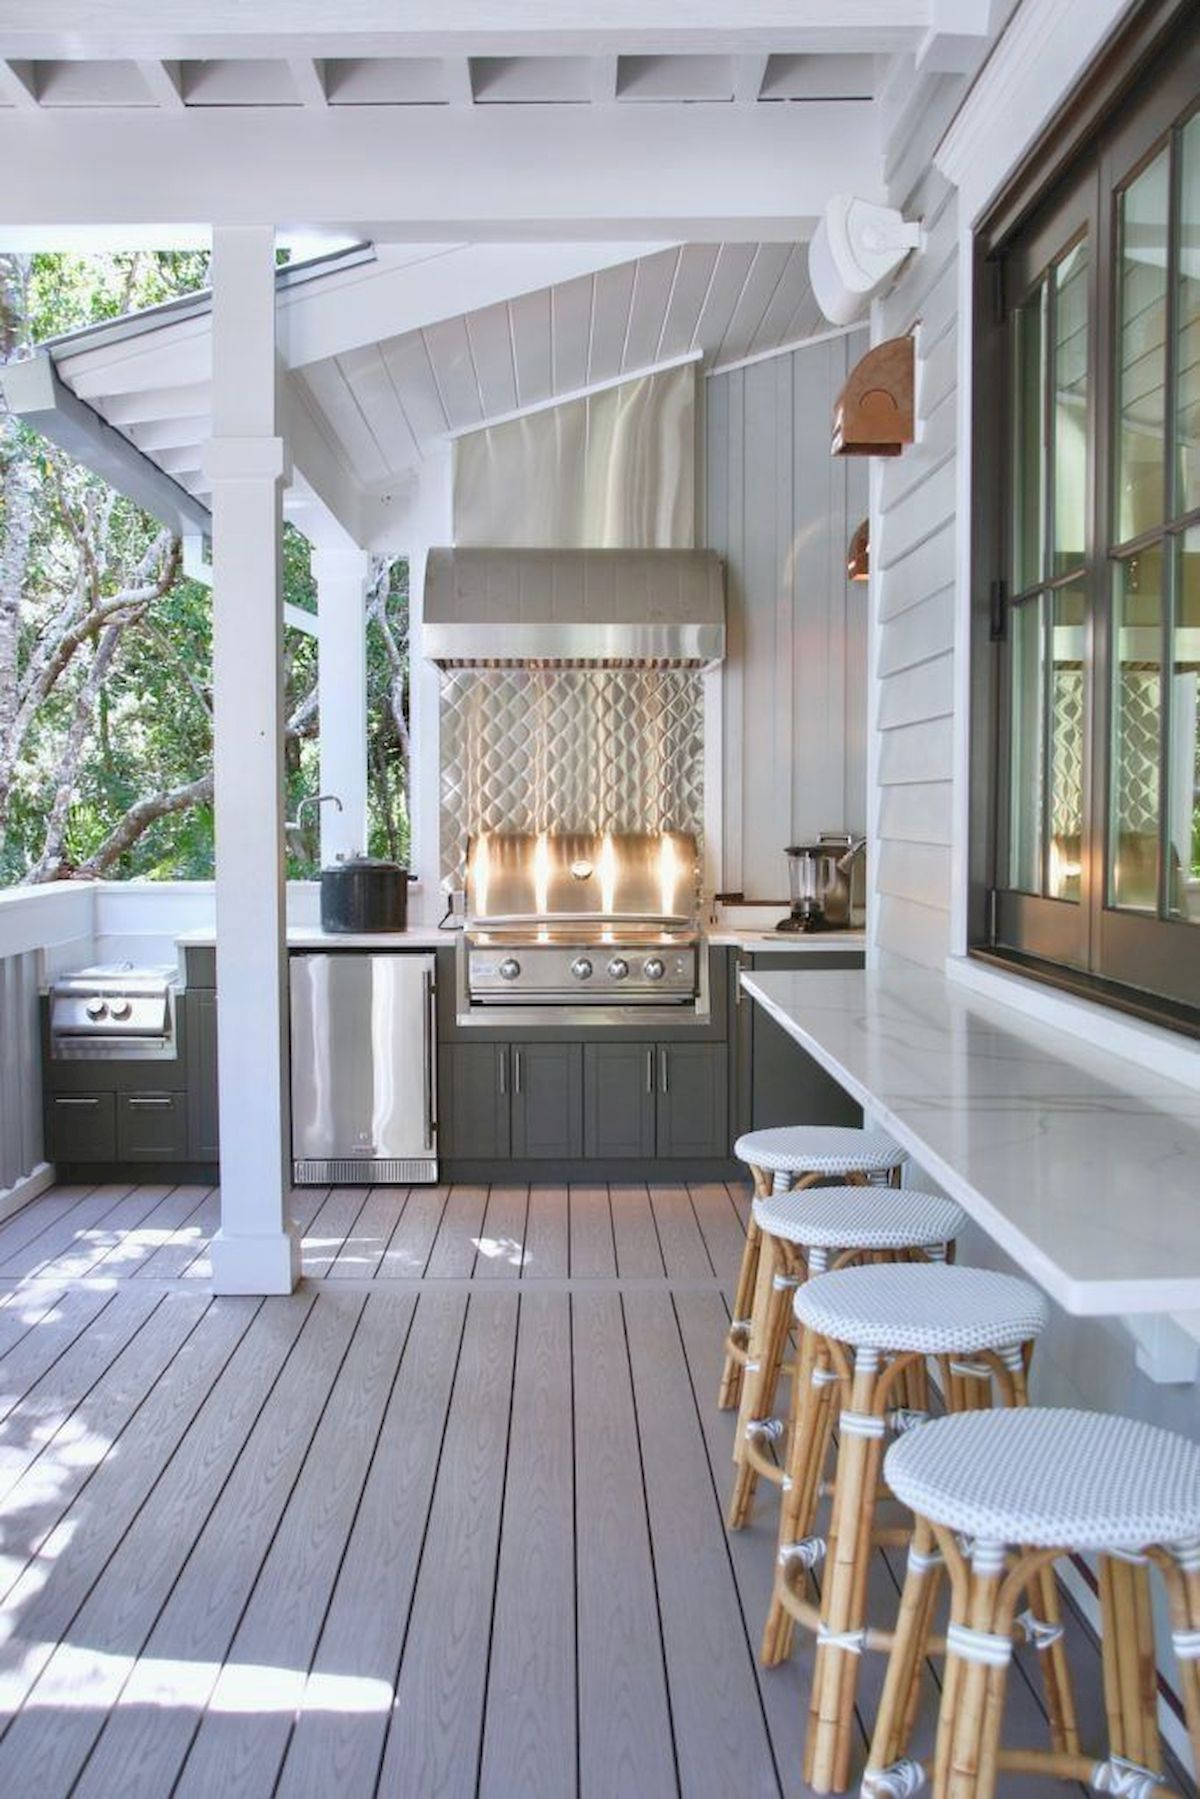 Way's To Make Pass Through Kitchen Window Ideas – pickndecor.com/design